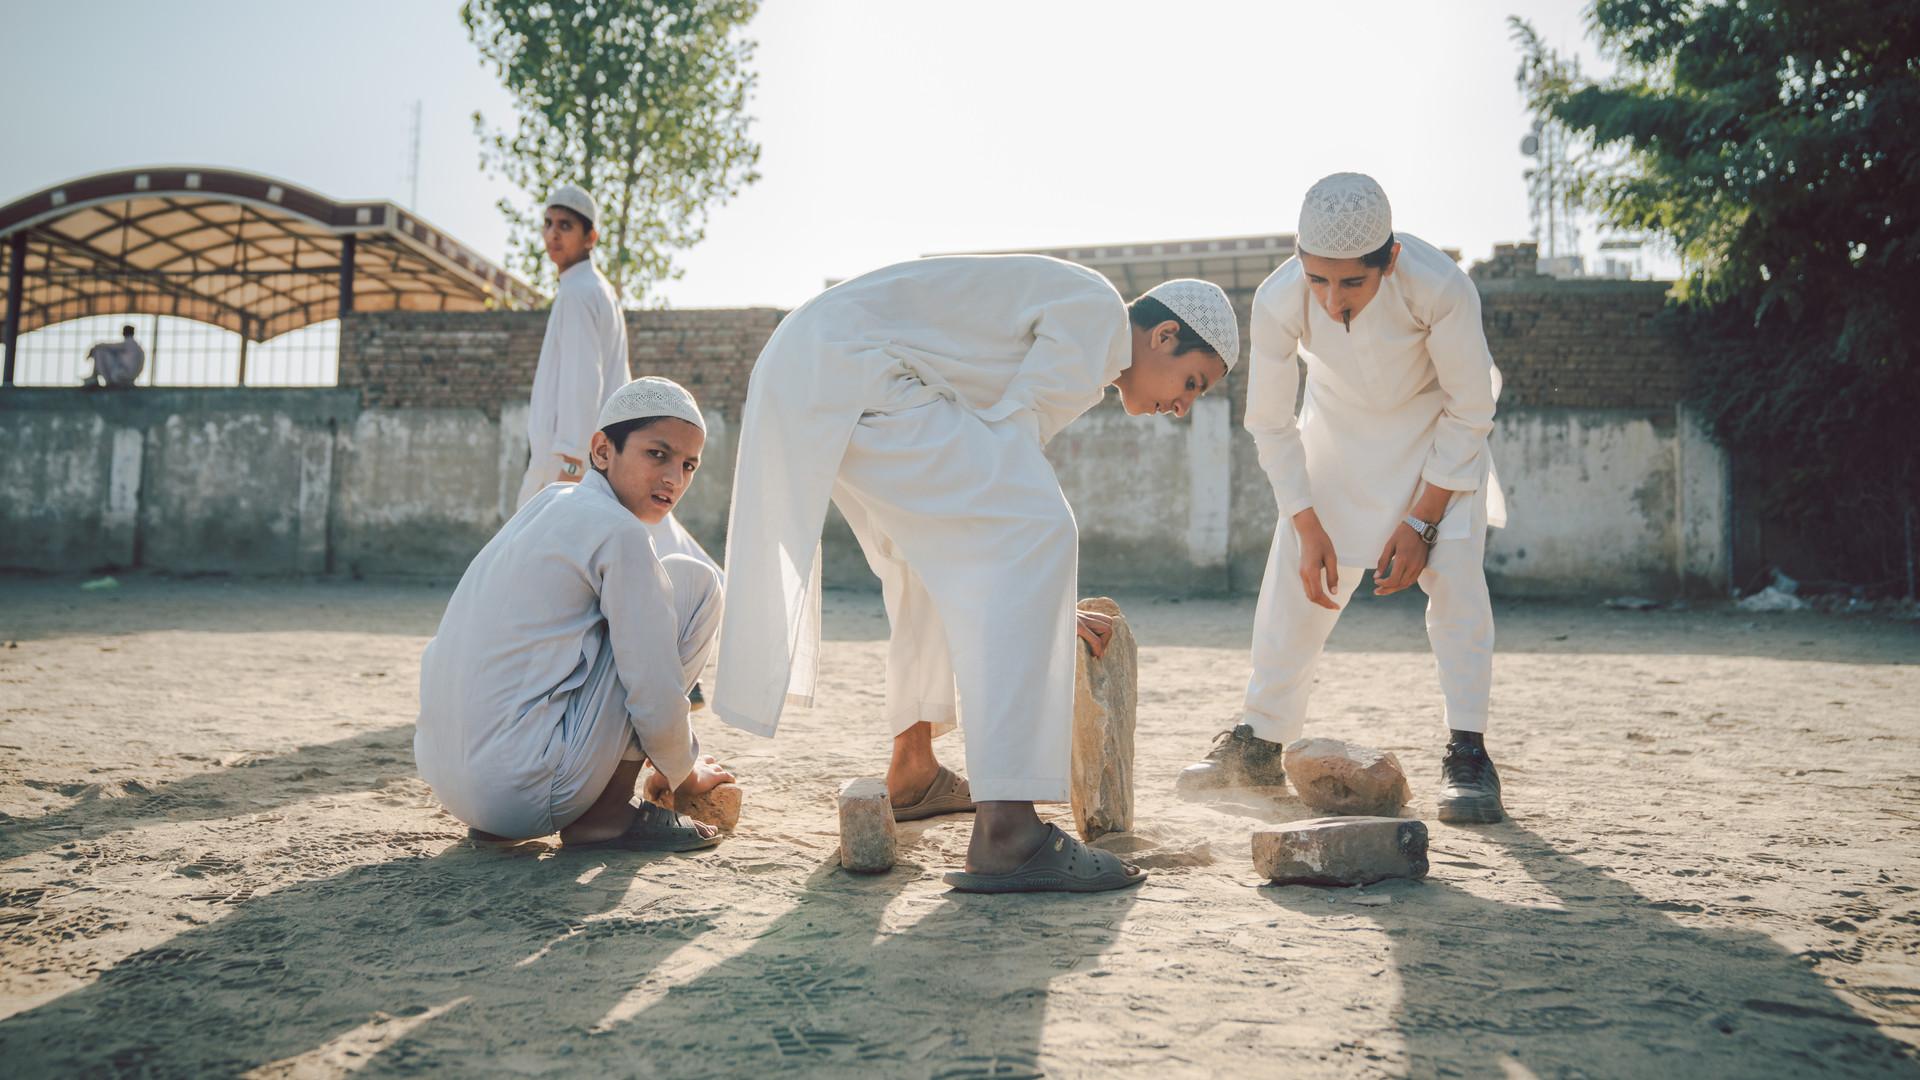 Pakistan-04100.jpg